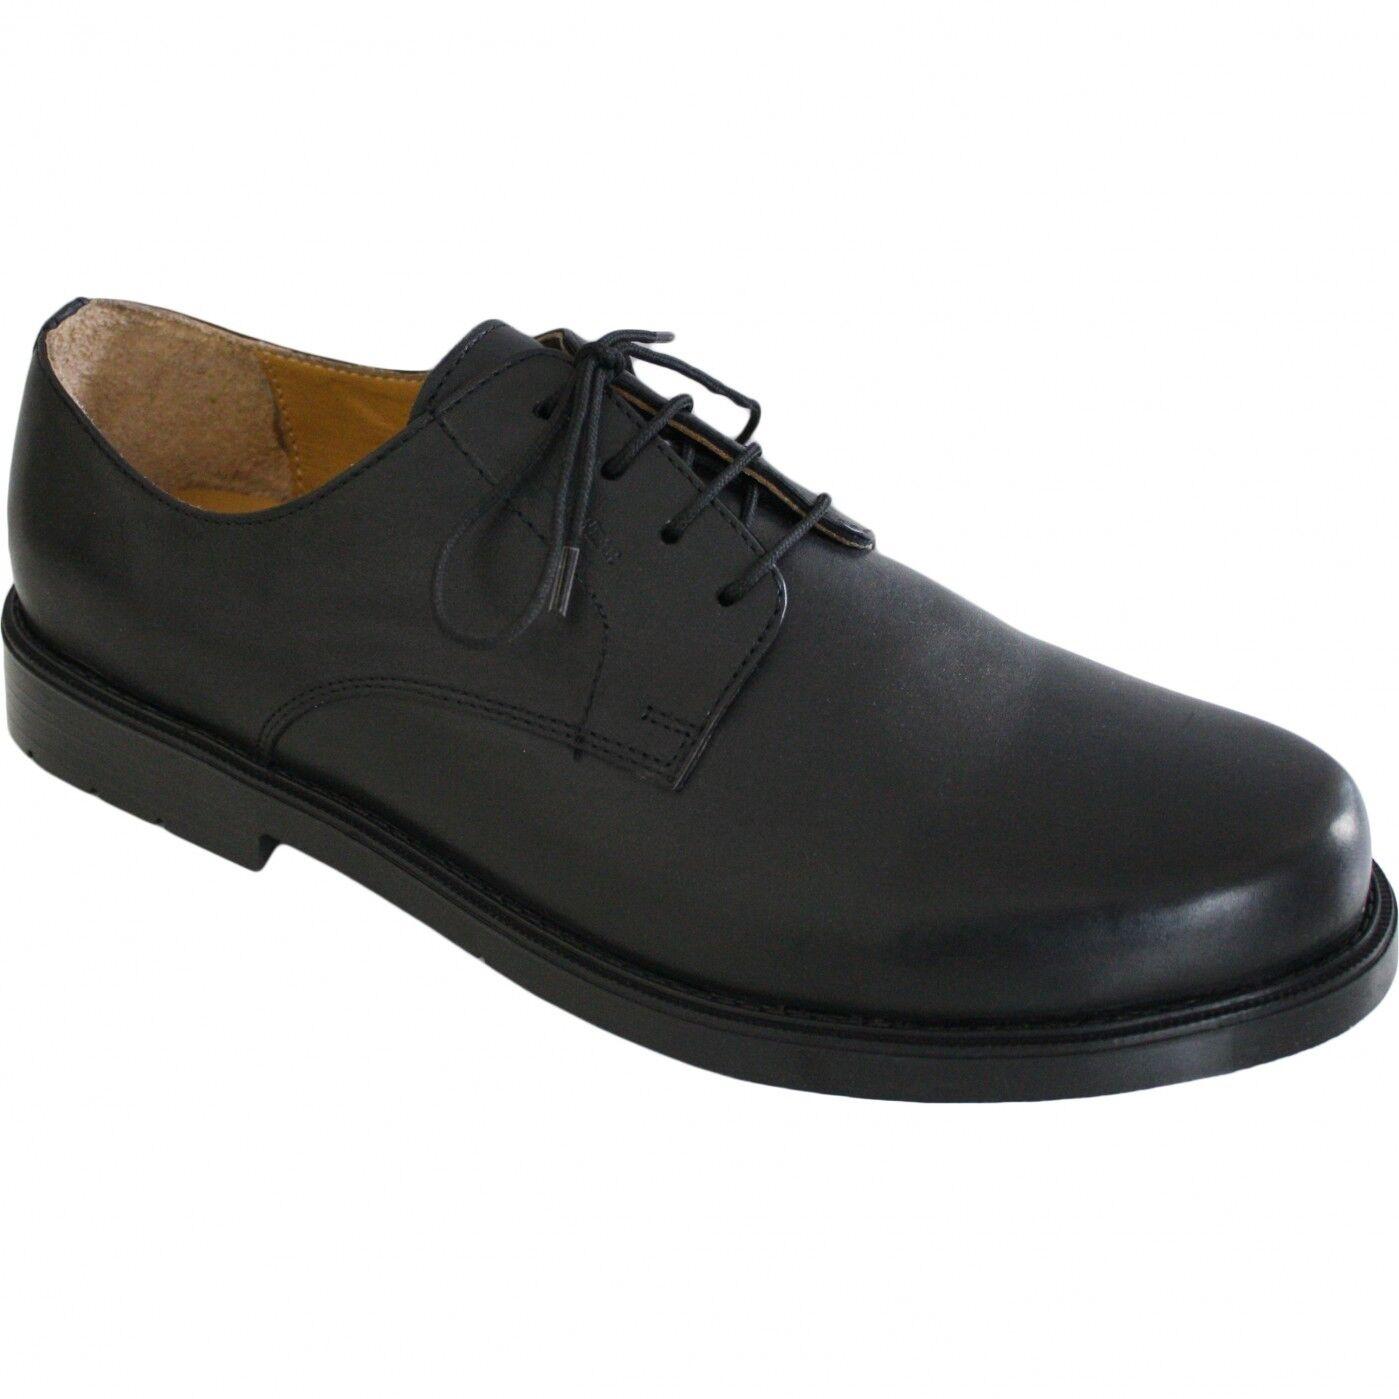 German Schuhe Wear, Business-schuhe Halbschuhe Lederschuhe Schuhe German schwarz 2c2f14